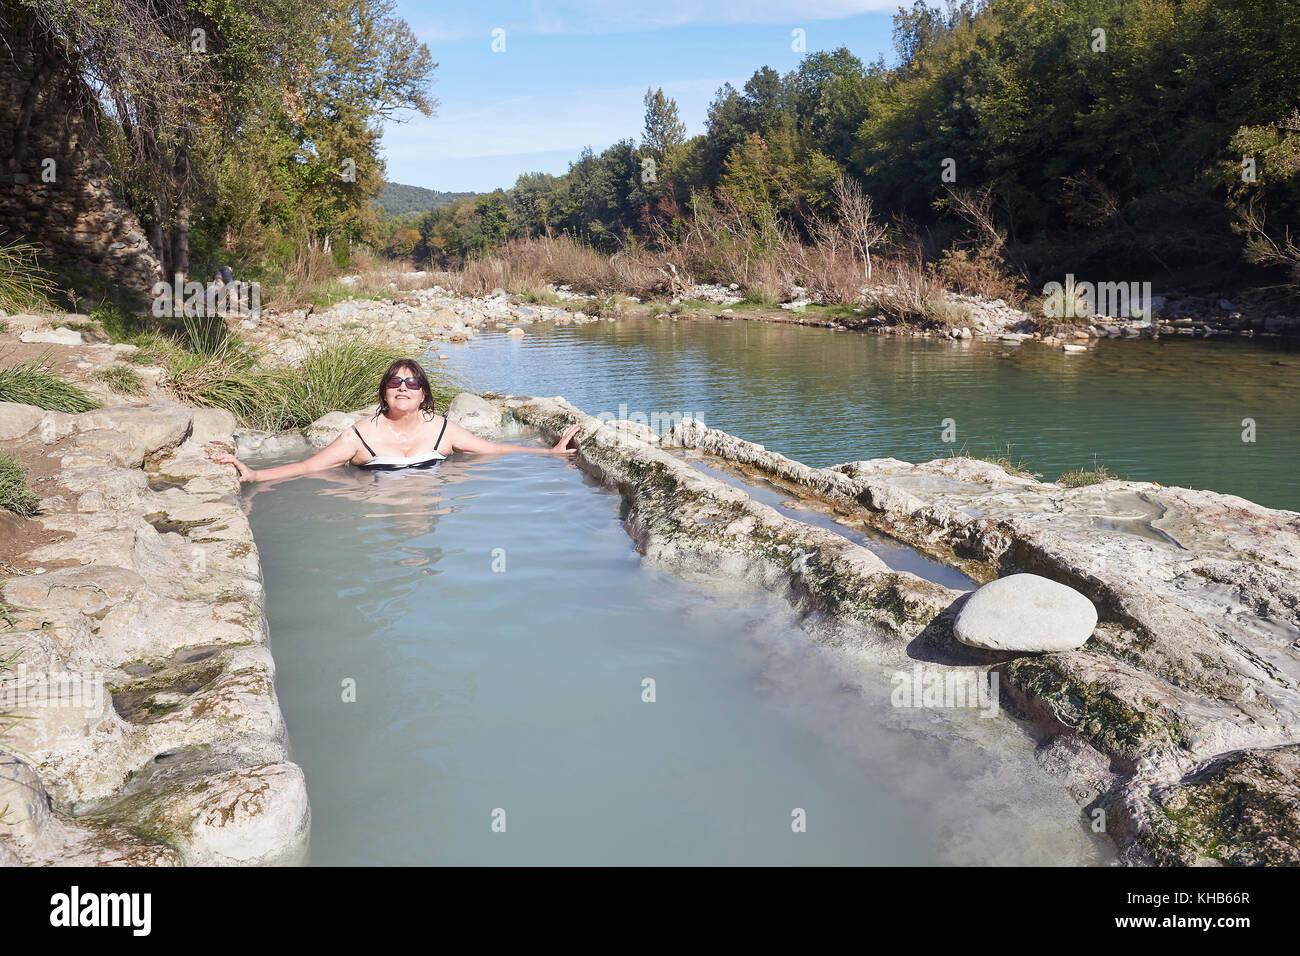 Bagni di Petriolo, die heißen Quellen auf dem Fluss Farma, Bezirk ...